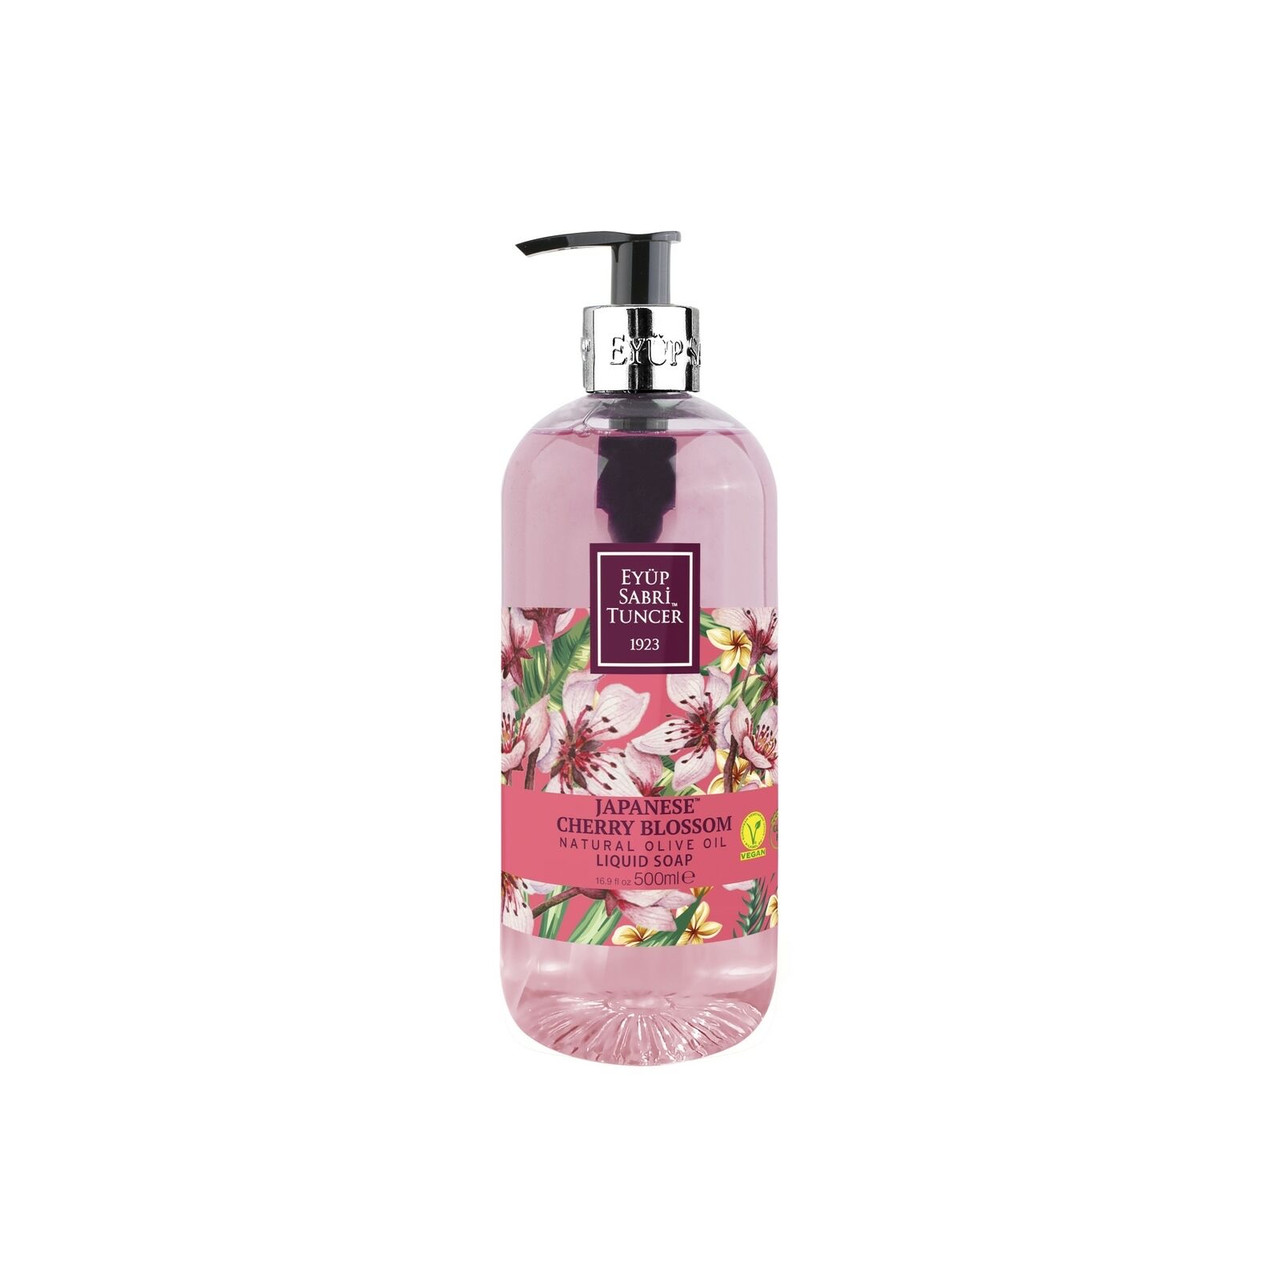 Жидкое мыло для рук Cherry Blossom Eyup Sabri Tuncer